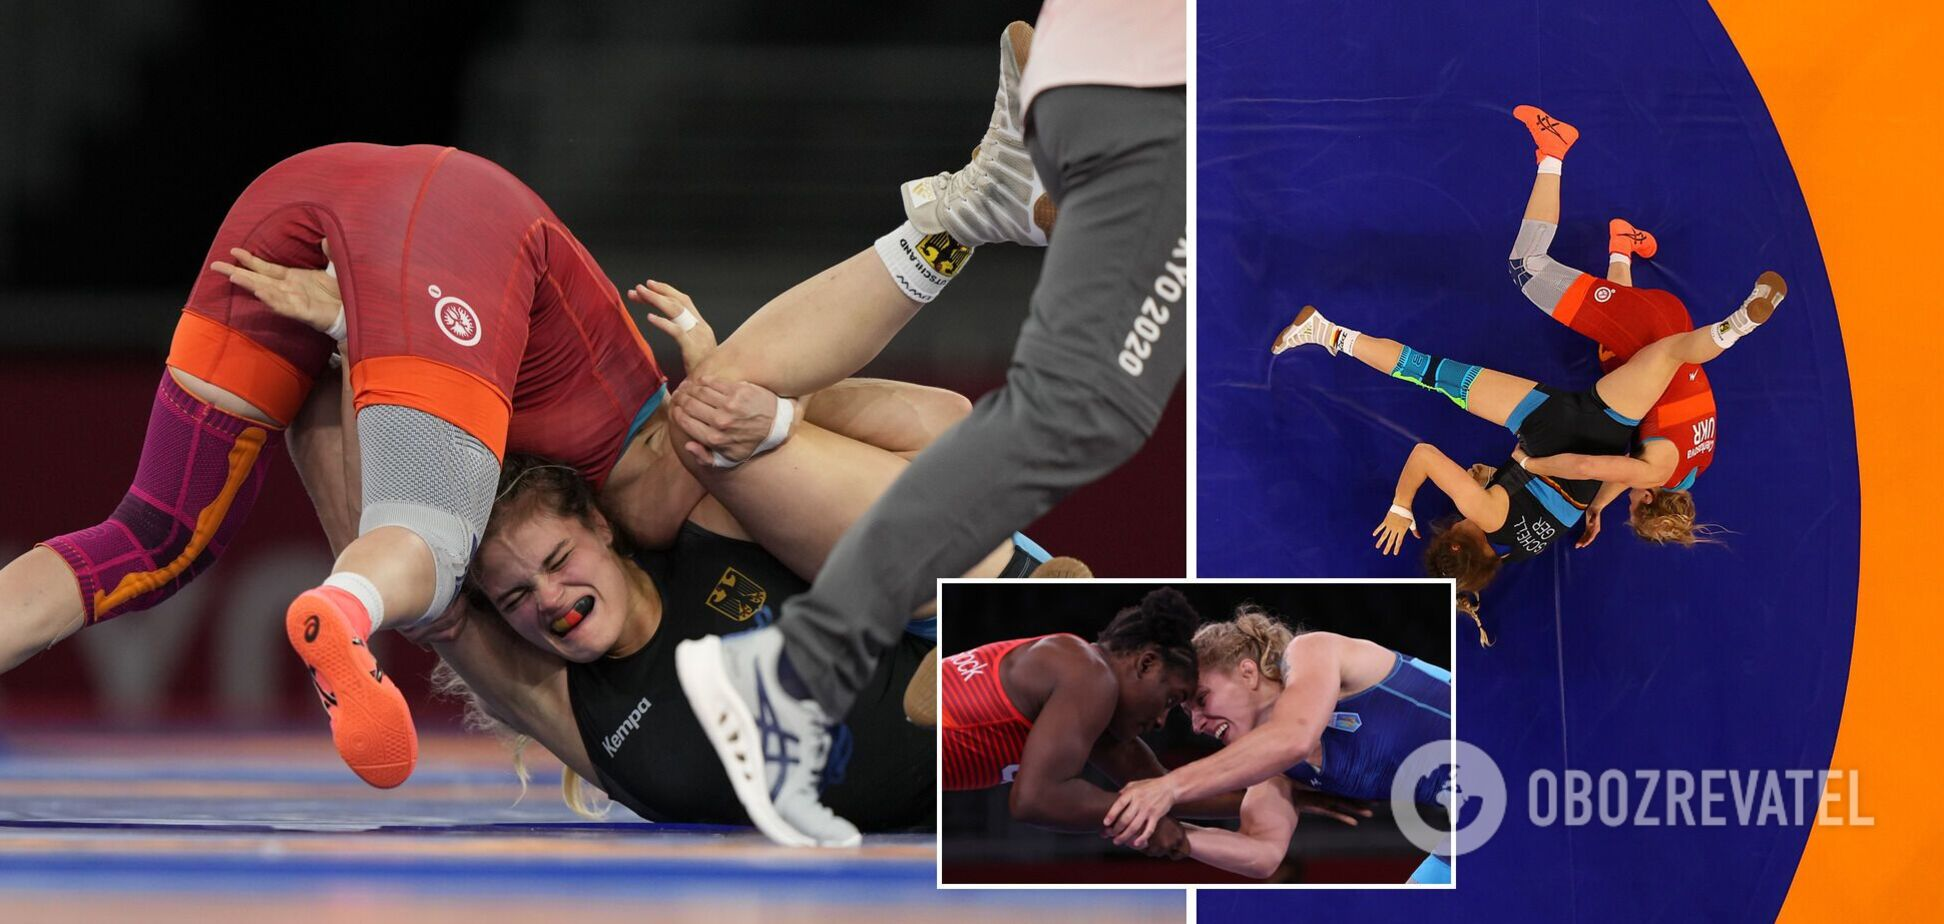 Украина сенсационно завоевала 8 медаль на Олимпиаде-2020